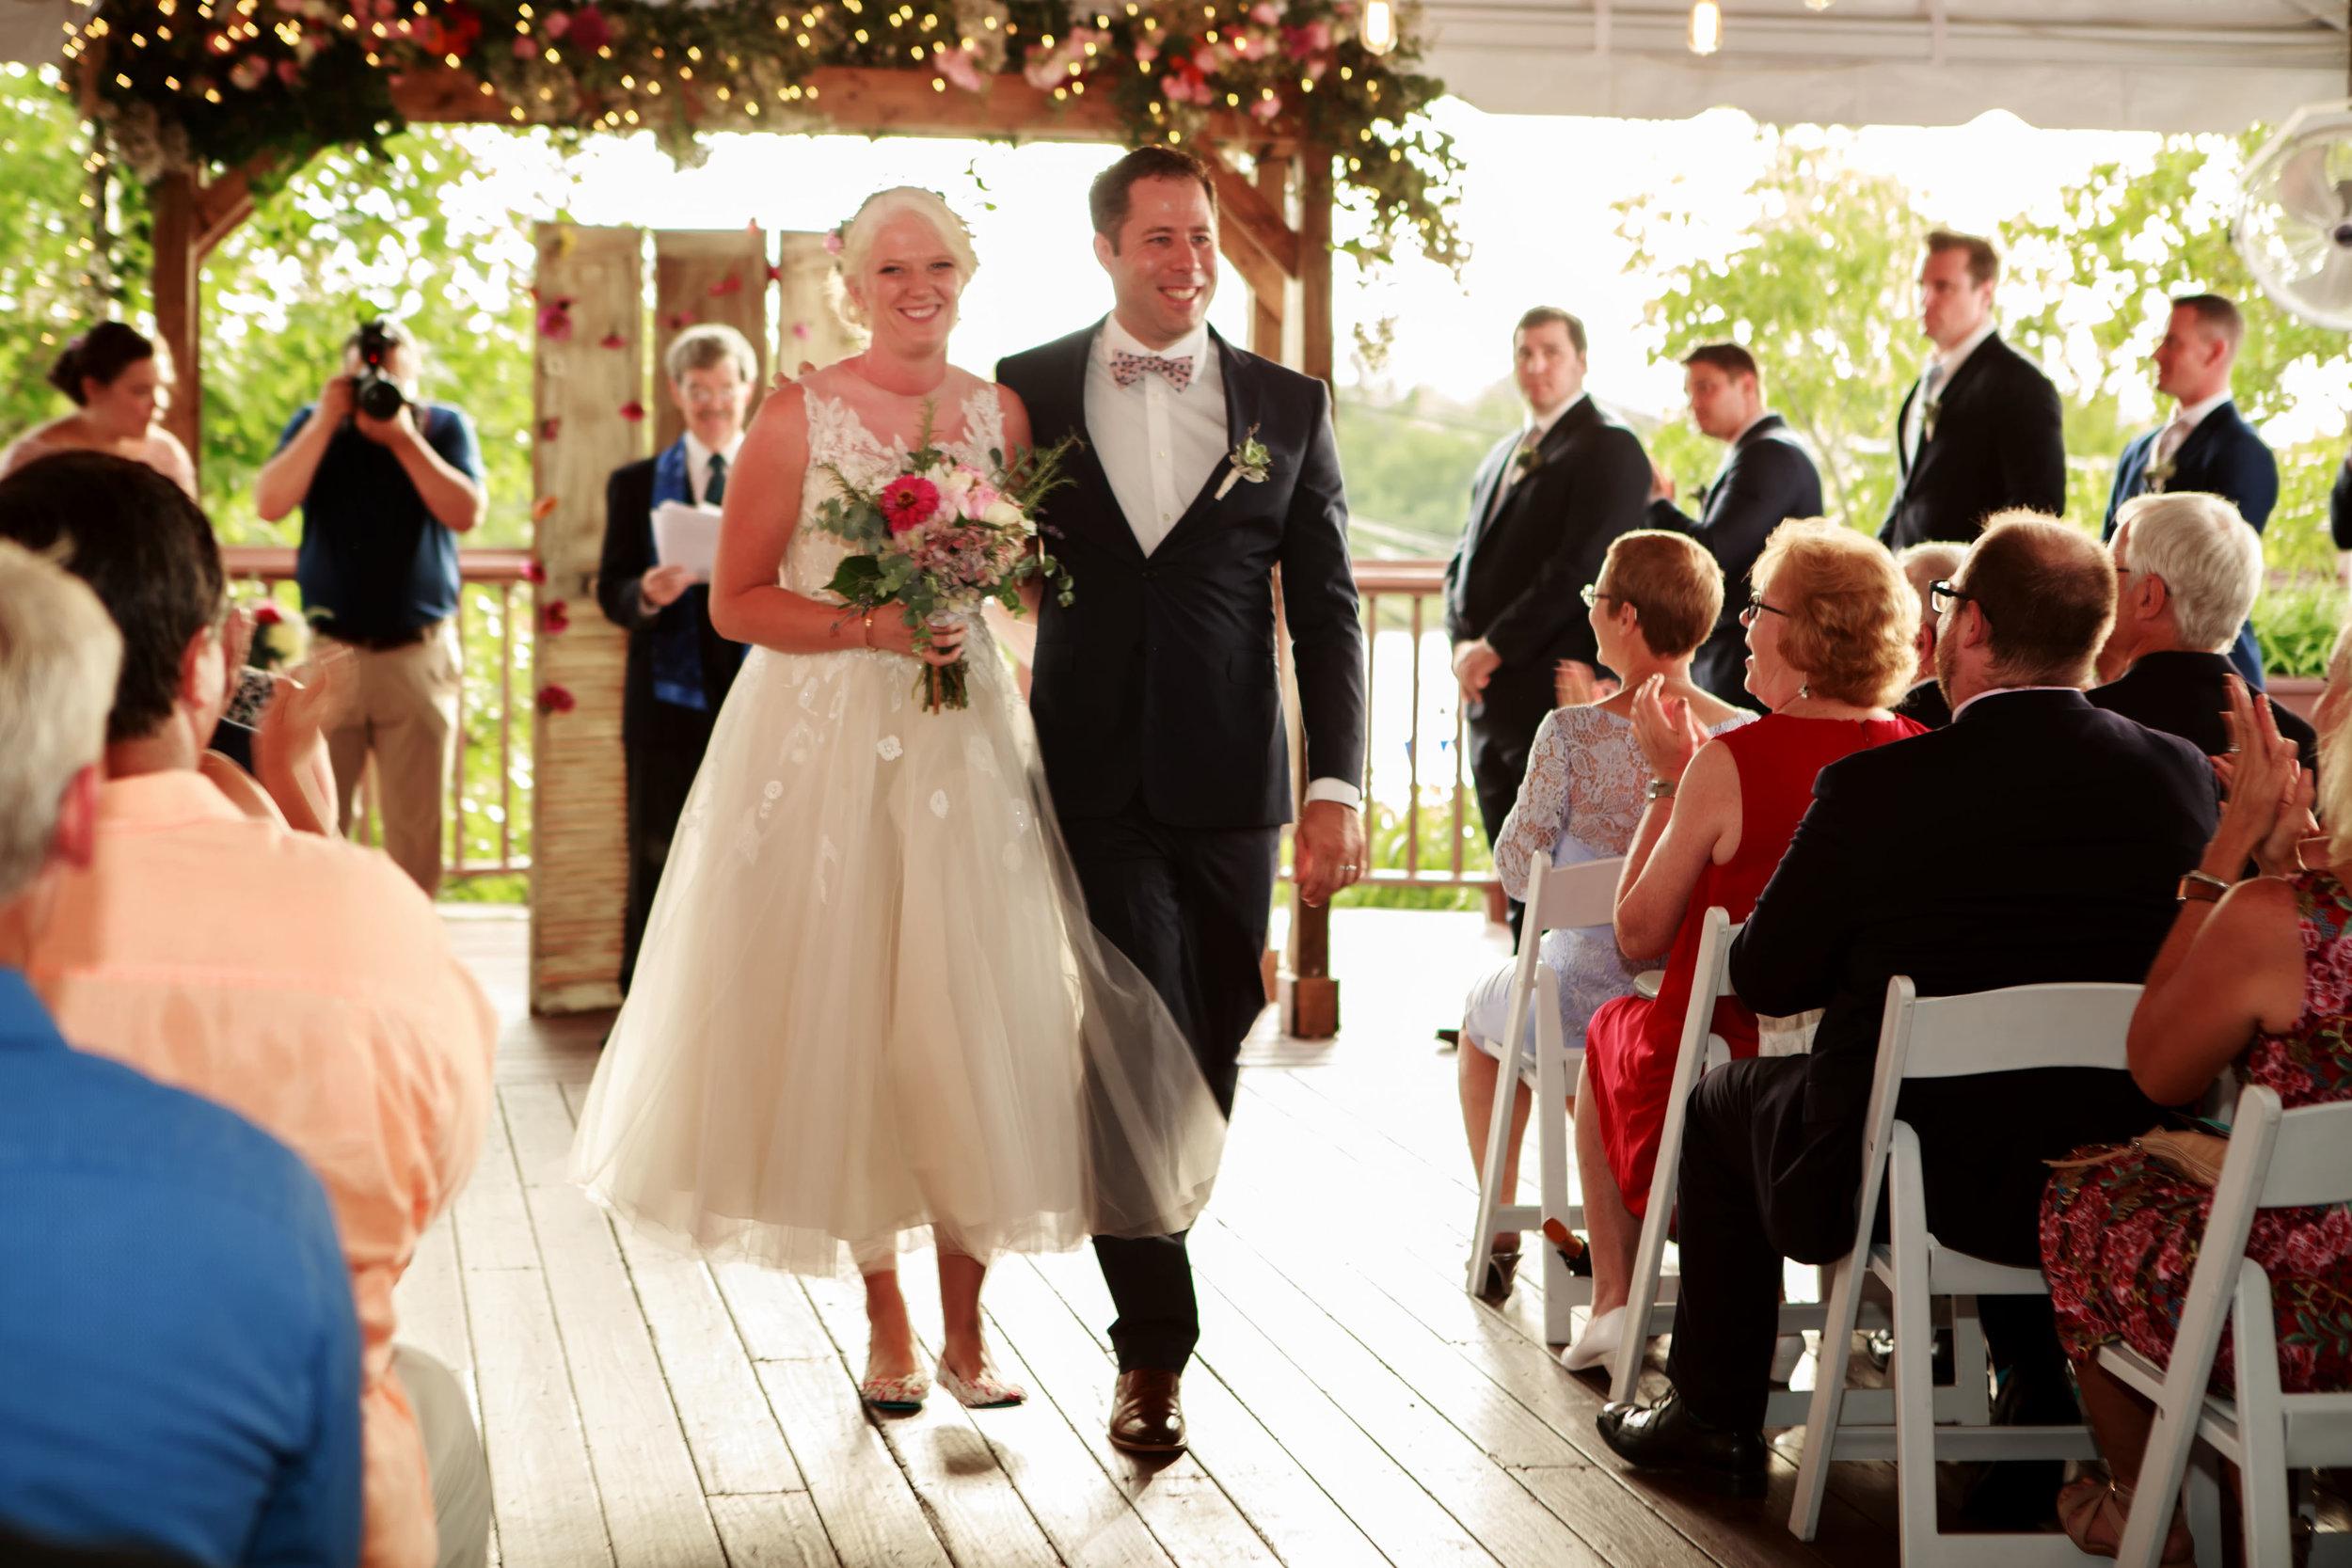 128-South-Wedding-Wilmington-NC-Photographer-Ceremony-26.1.jpg